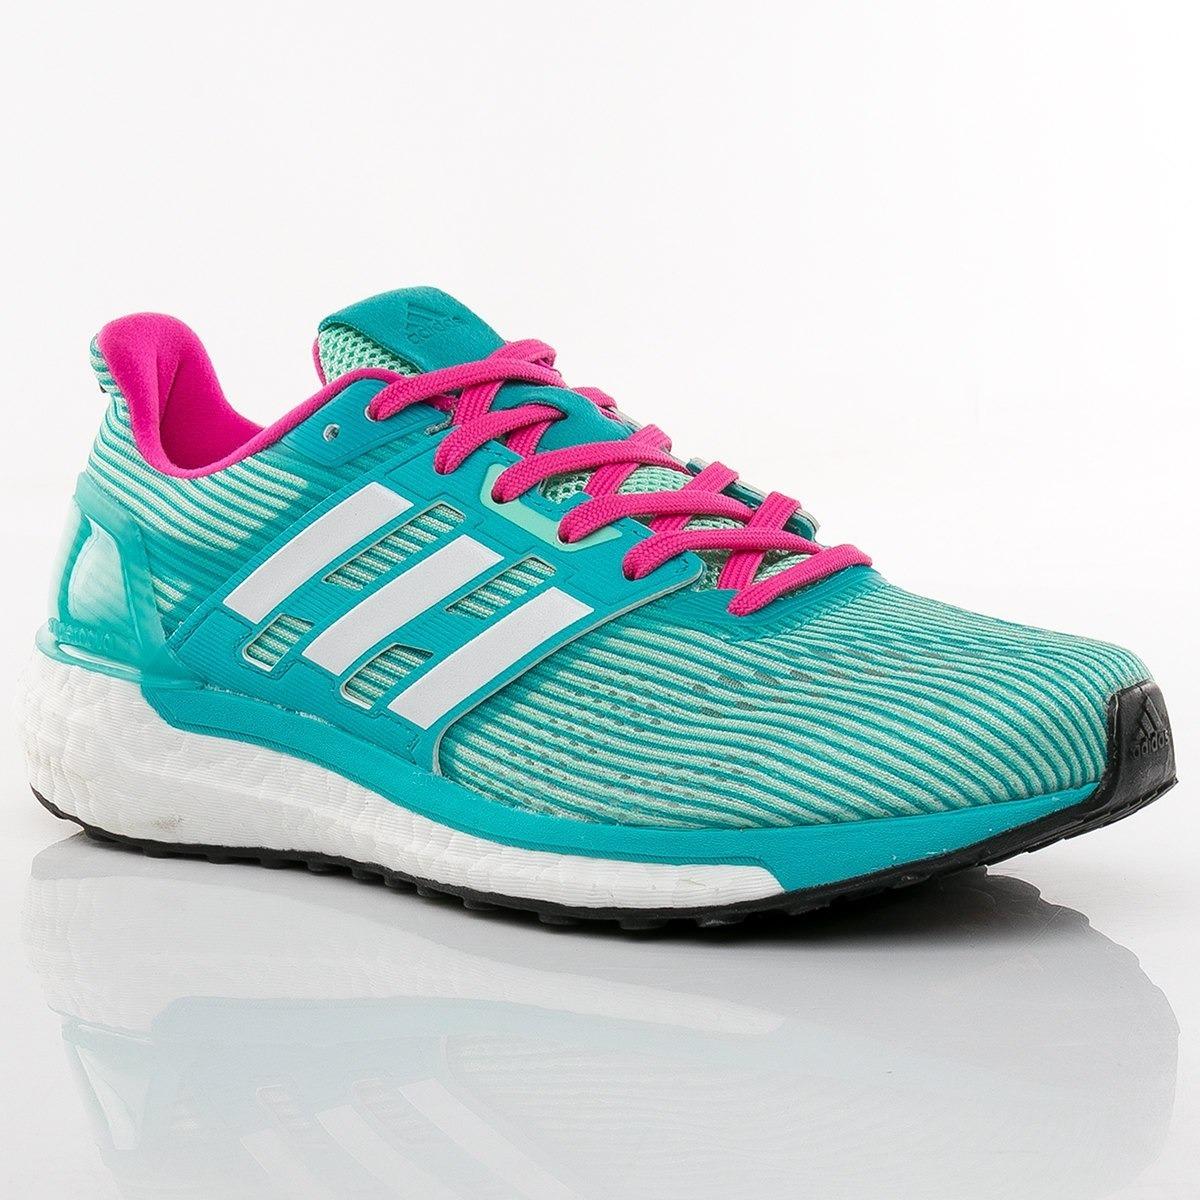 best authentic 5363d 91aa2 zapatillas de running adidas supernova glide 9 mujer. Cargando zoom.